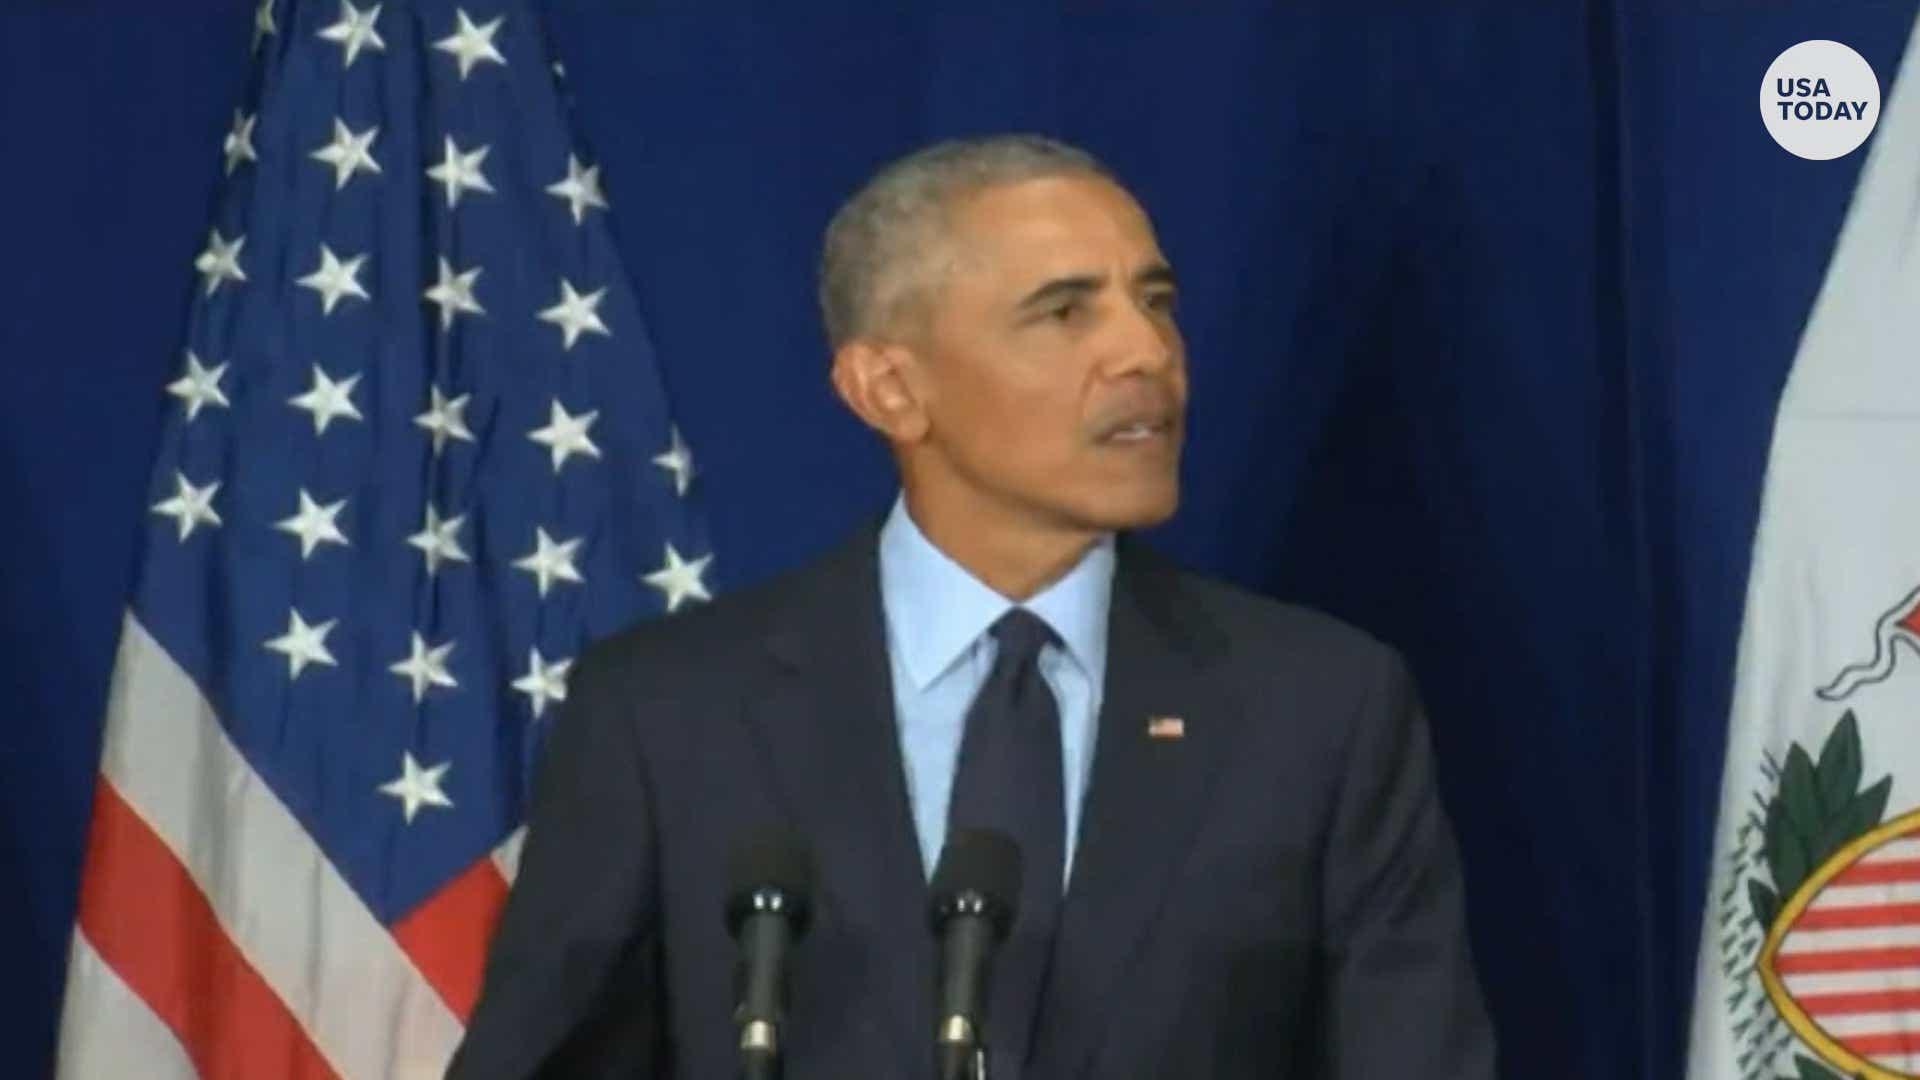 President Barack Obama S Speech Transcript Slamming Trump